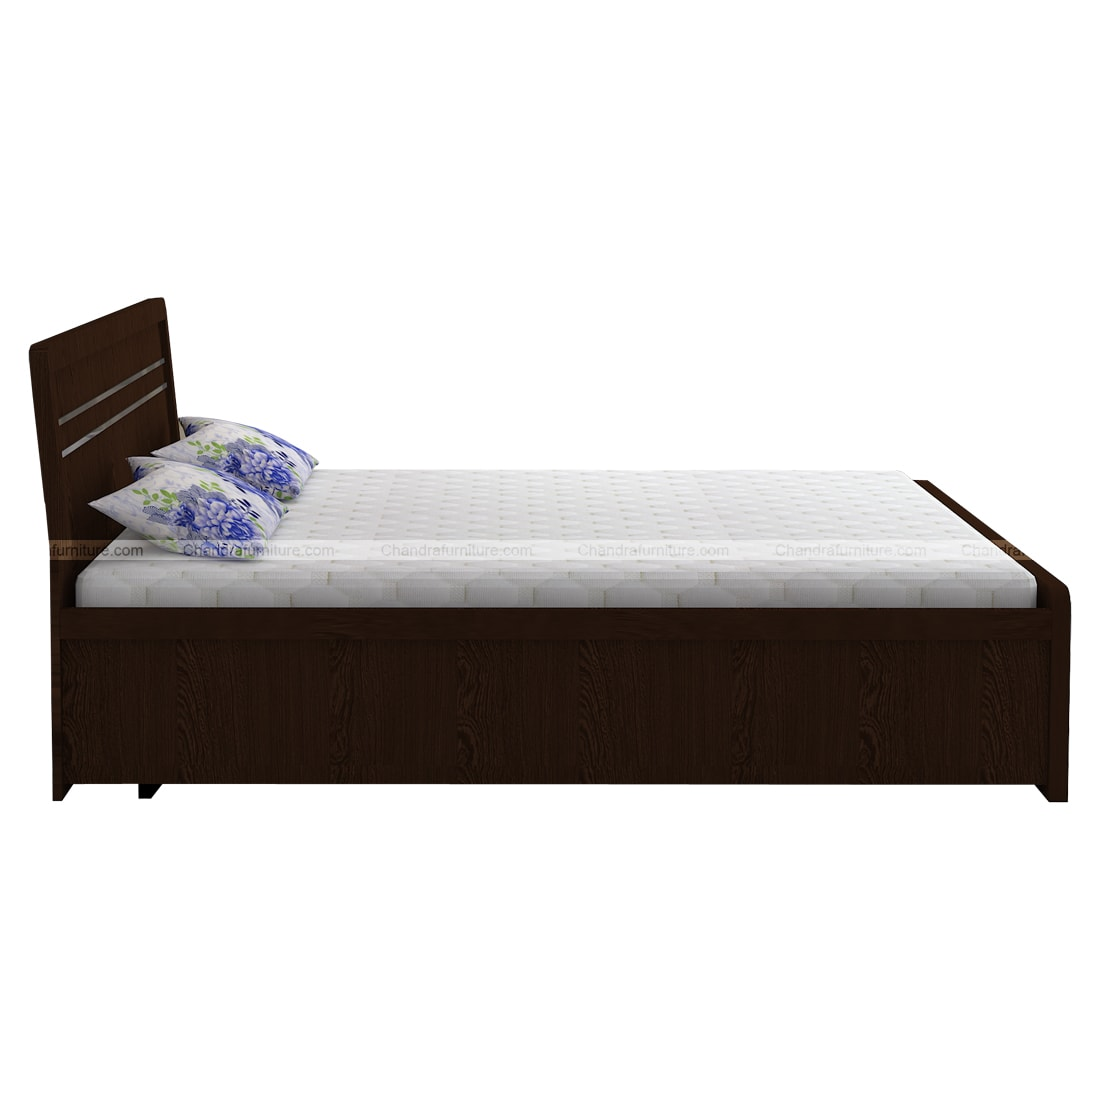 Chandra Furniture King Size Bed - Senet